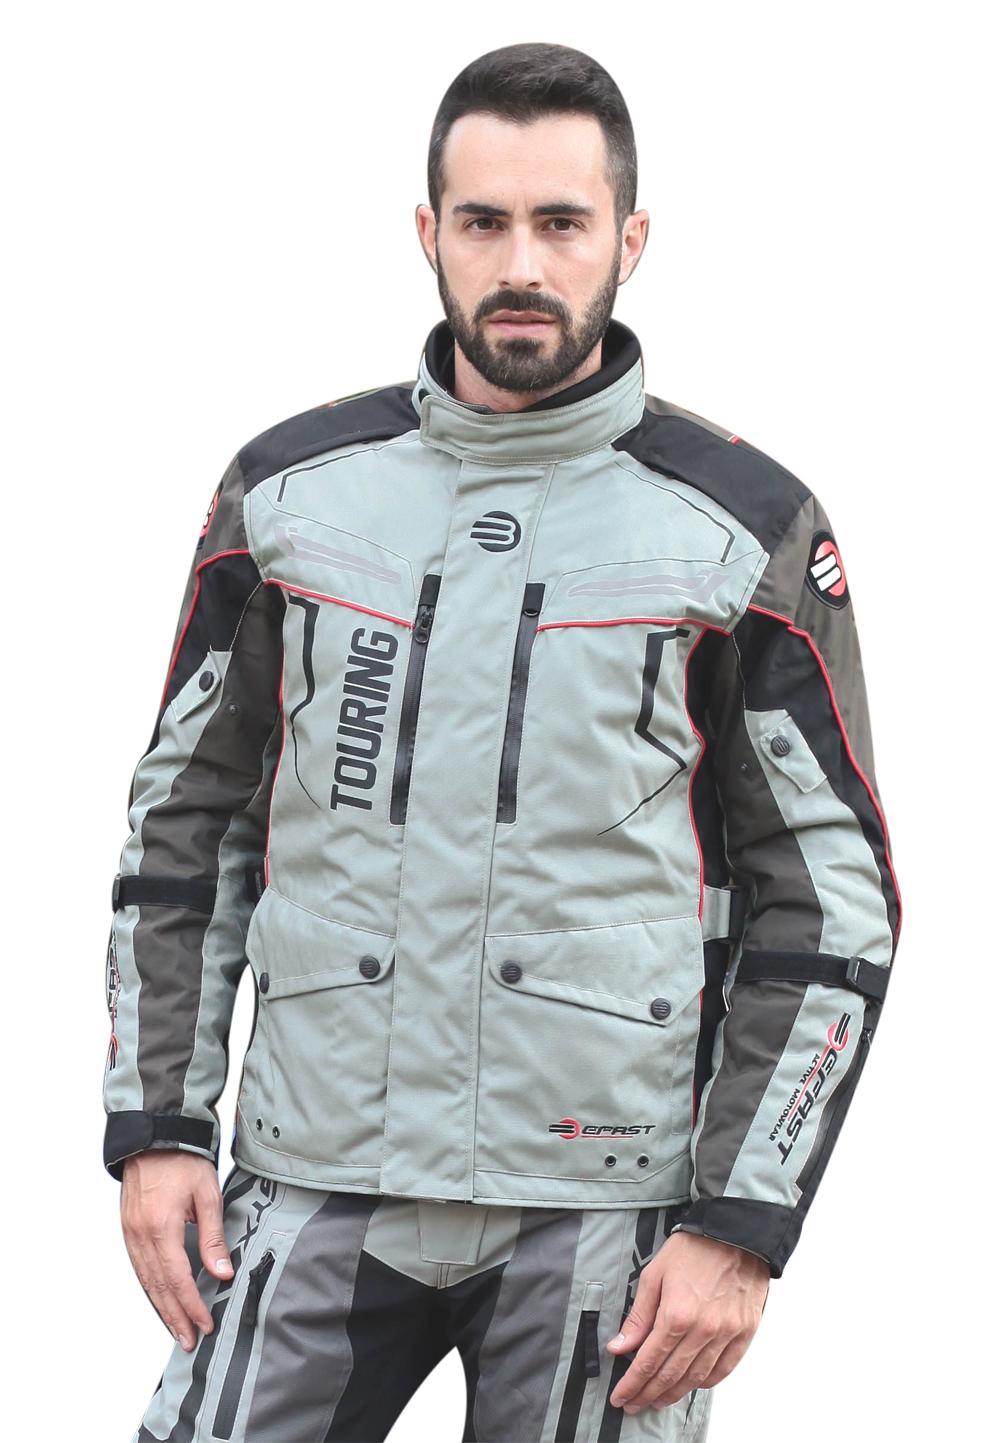 Giacca moto Befast GTX-2 Touring 4 stagioni